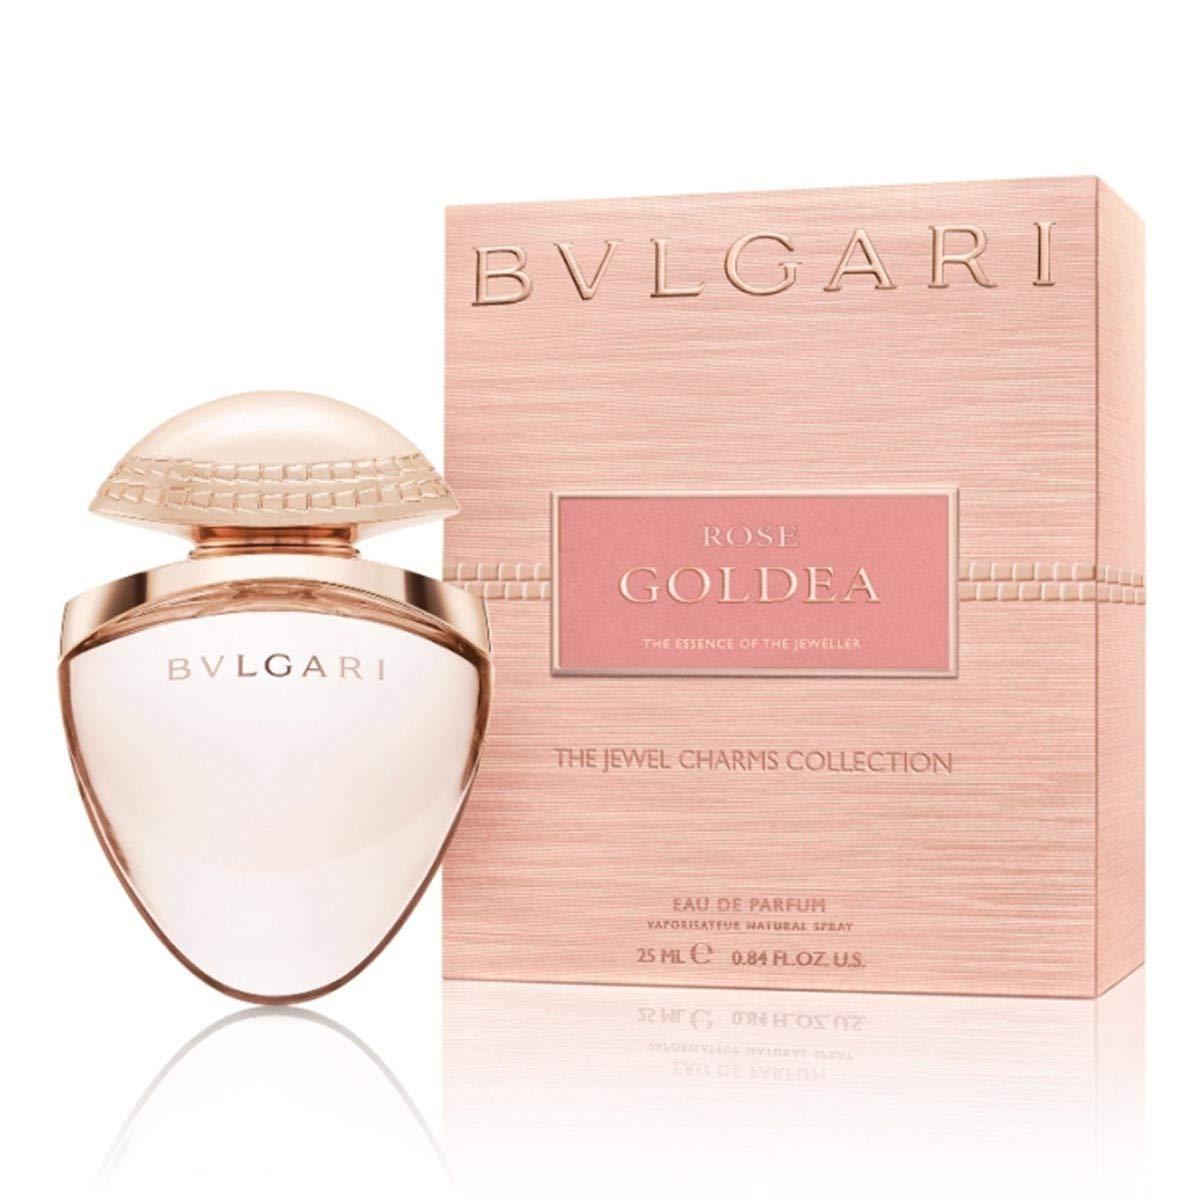 Bvlgari Rose Goldea Mujeres 25 ml - Eau de parfum (Mujeres, 25 ml, Musk o almizcle, Rosa, Aerosol, 1 pieza(s))